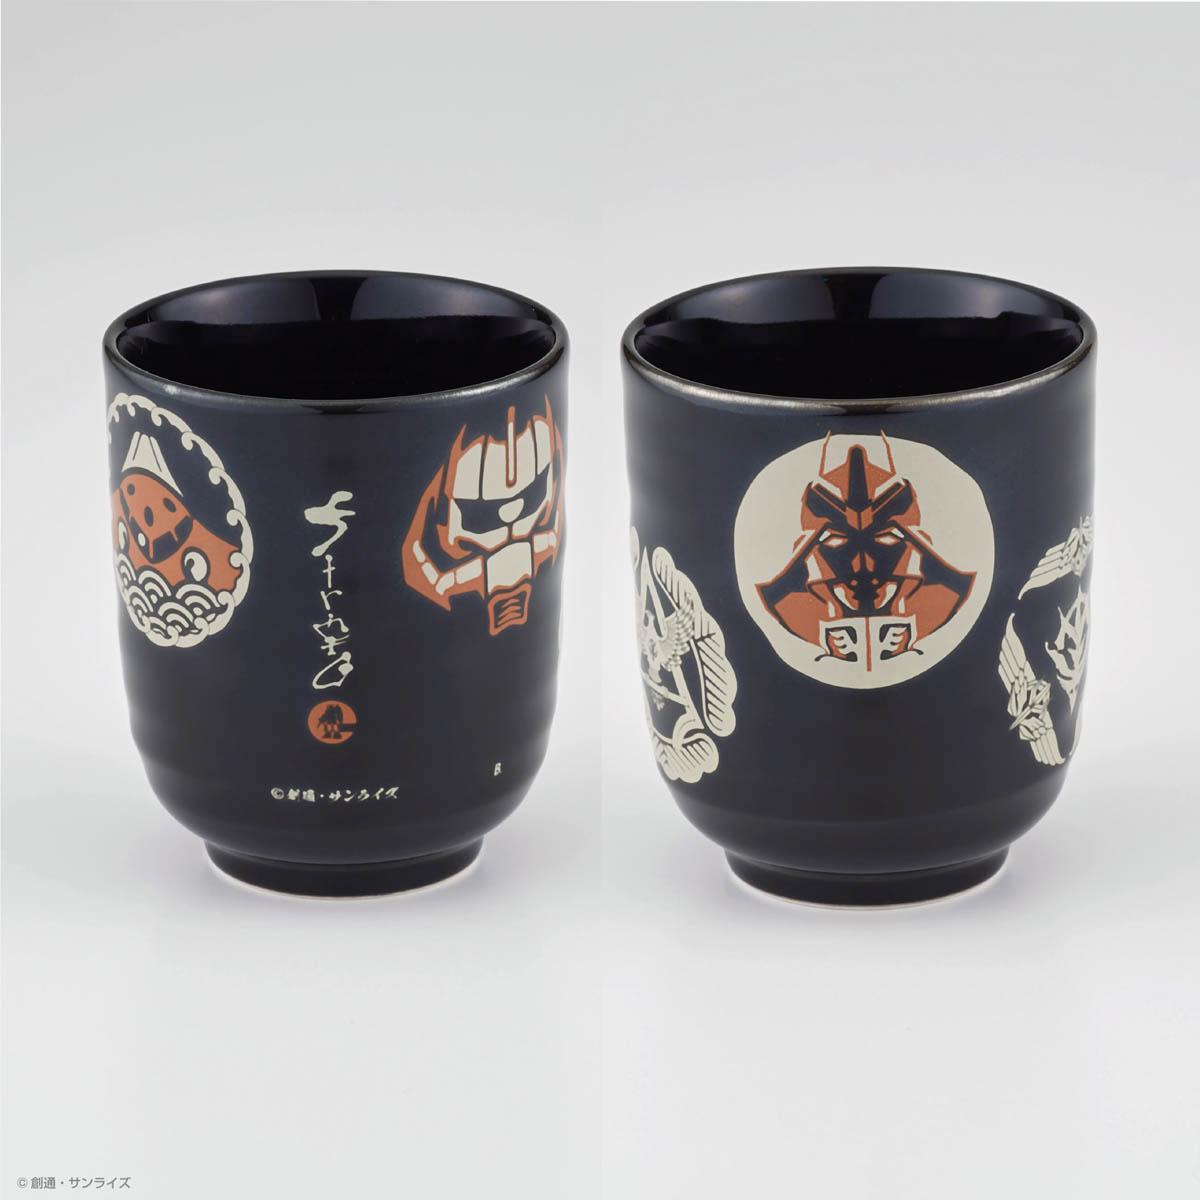 STRICT-G JAPAN 「機動戦士ガンダム」 湯呑 紋様柄